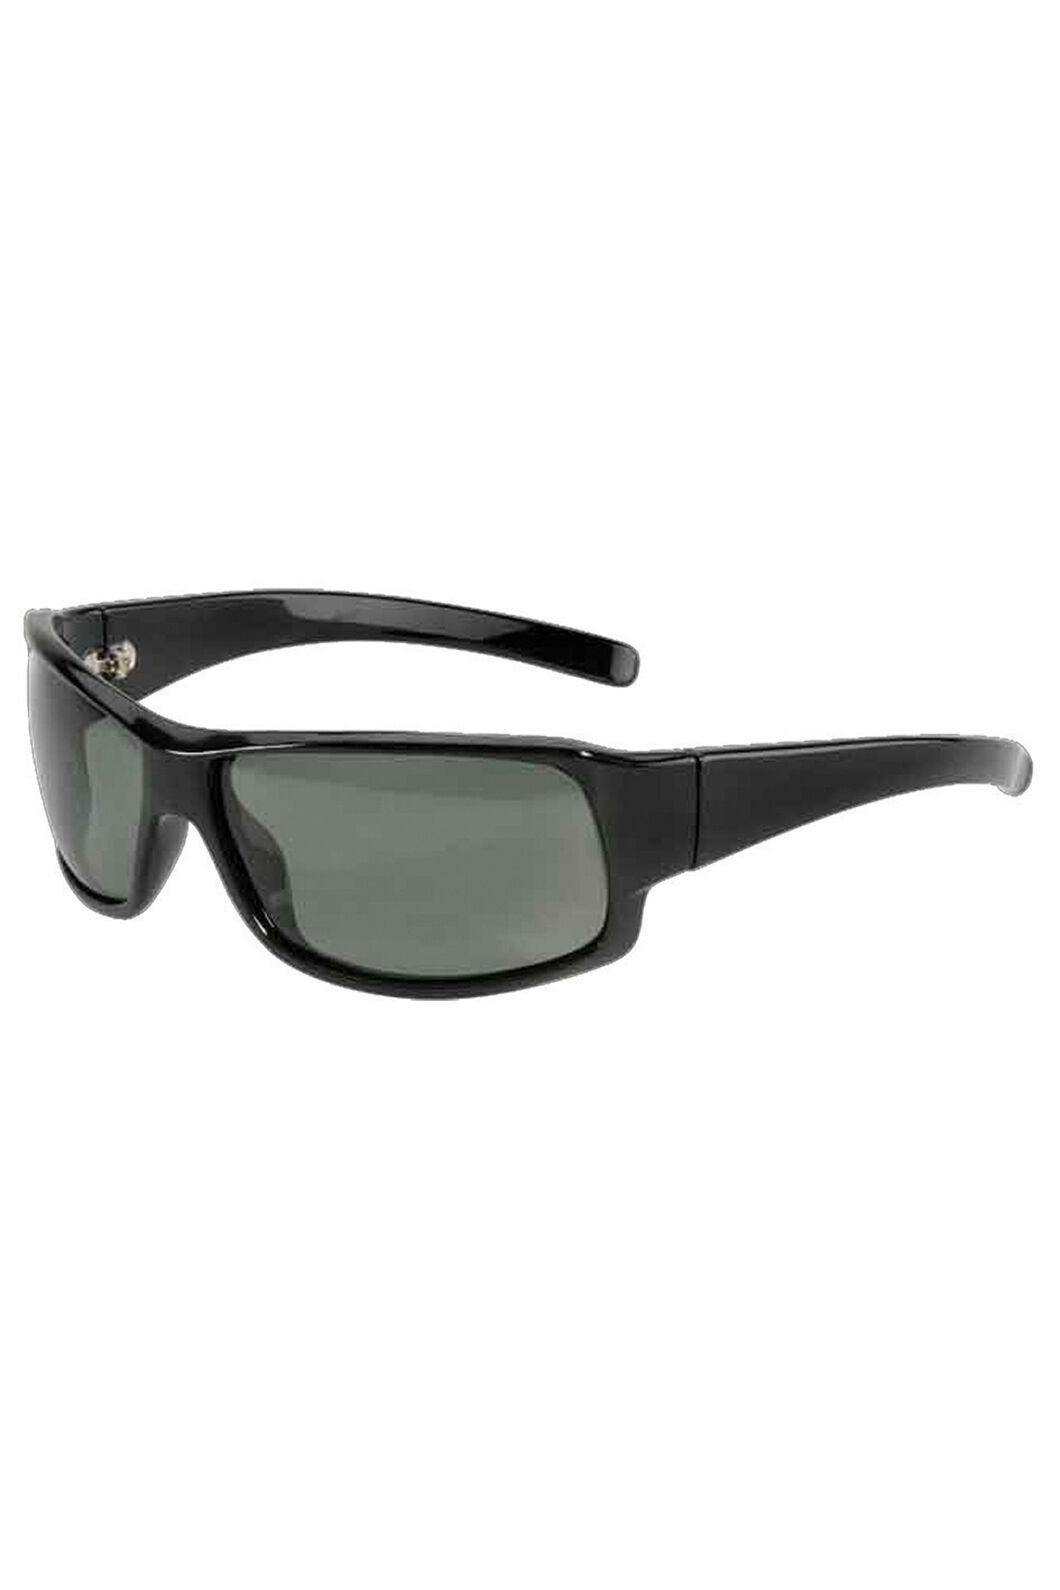 Cancer Council Unisex Balmain Sunglasses, Black, hi-res